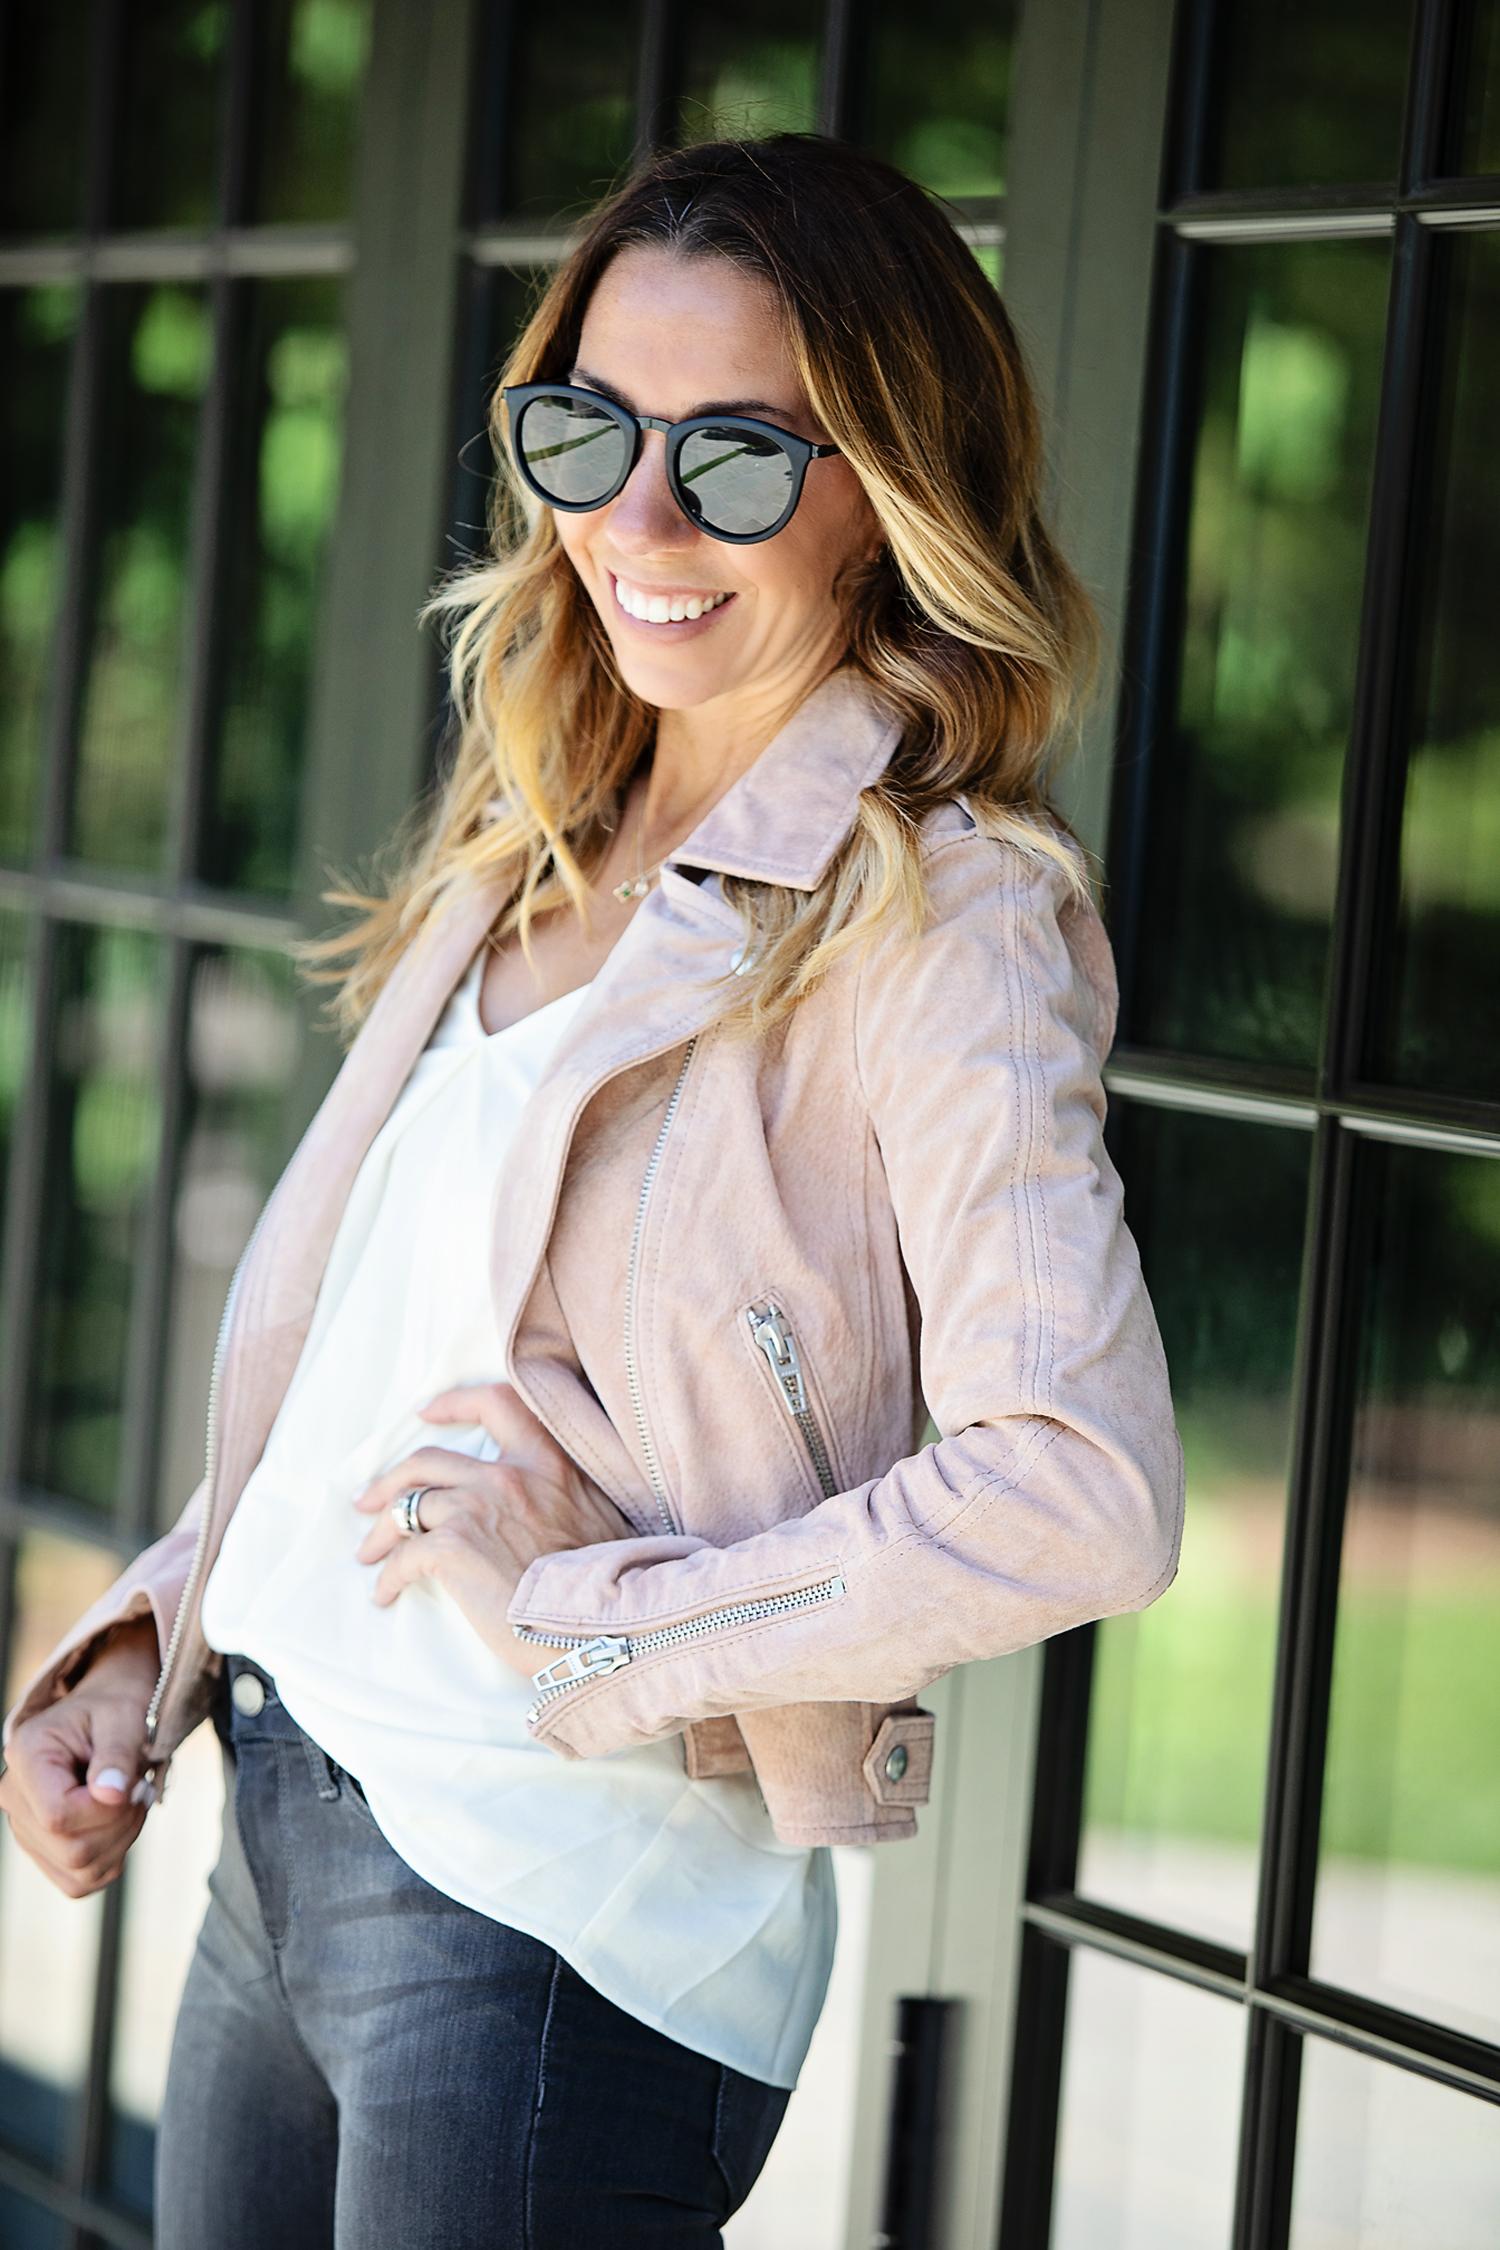 The Motherchic wearing blanknyc suede moto jacket